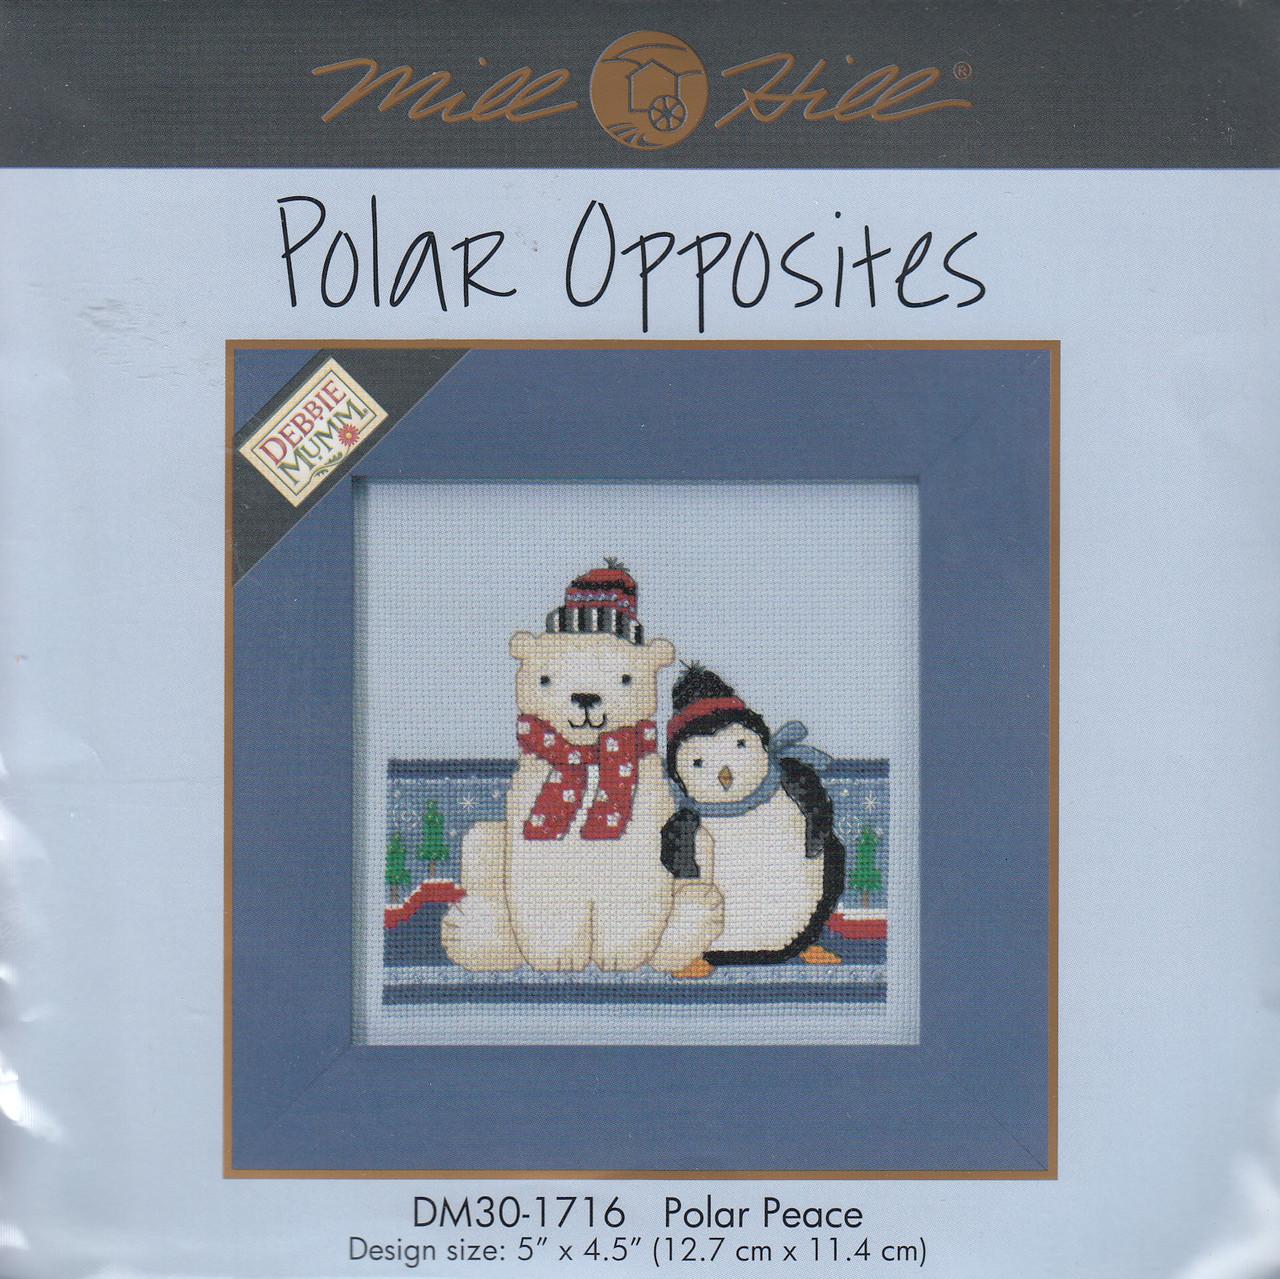 Mill Hill 2017 Debbie Mumm Polar Opposites - Polar Peace